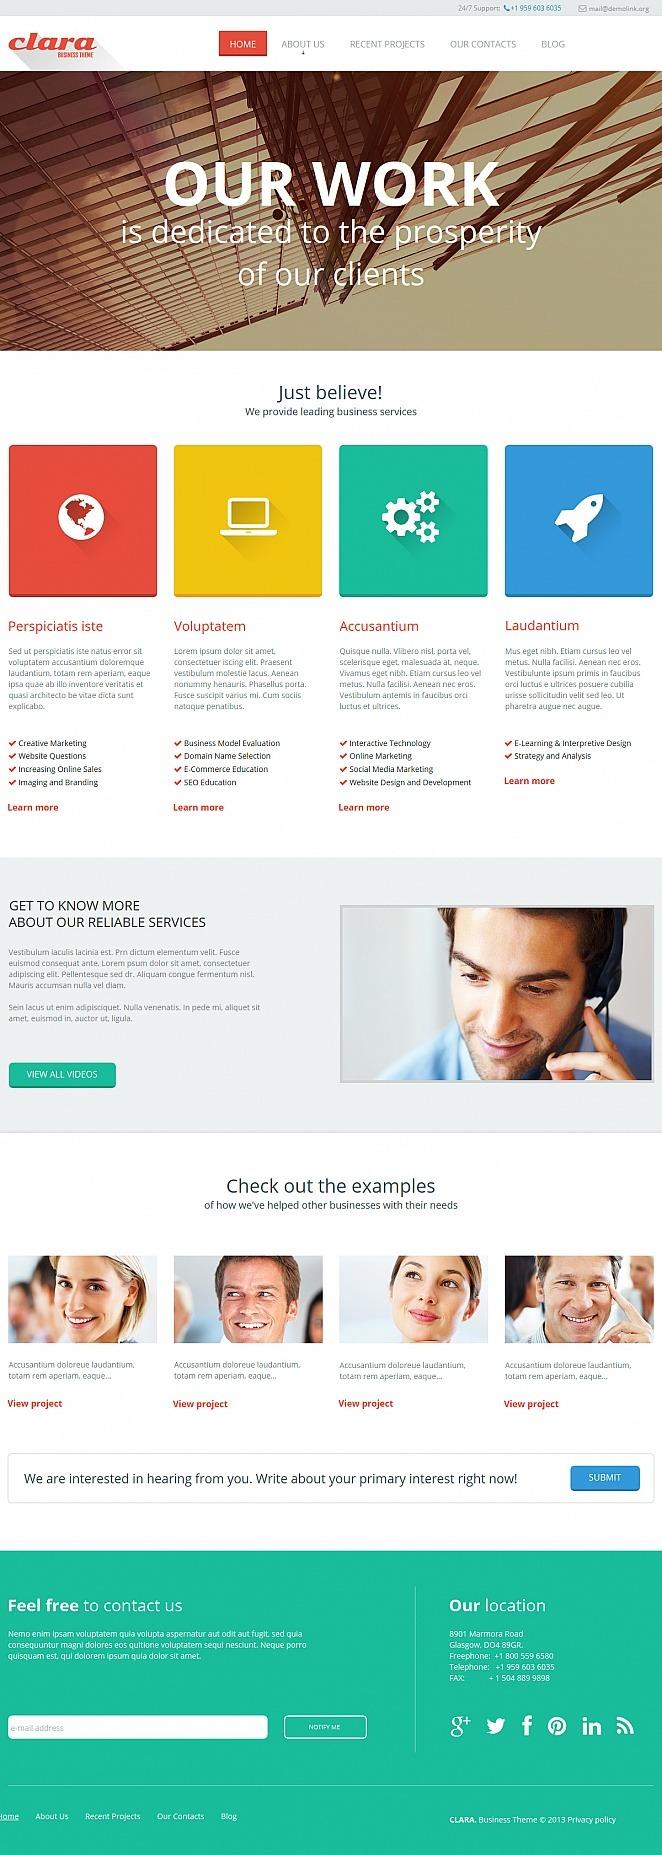 Merchant Services Moto CMS HTML Template New Screenshots BIG